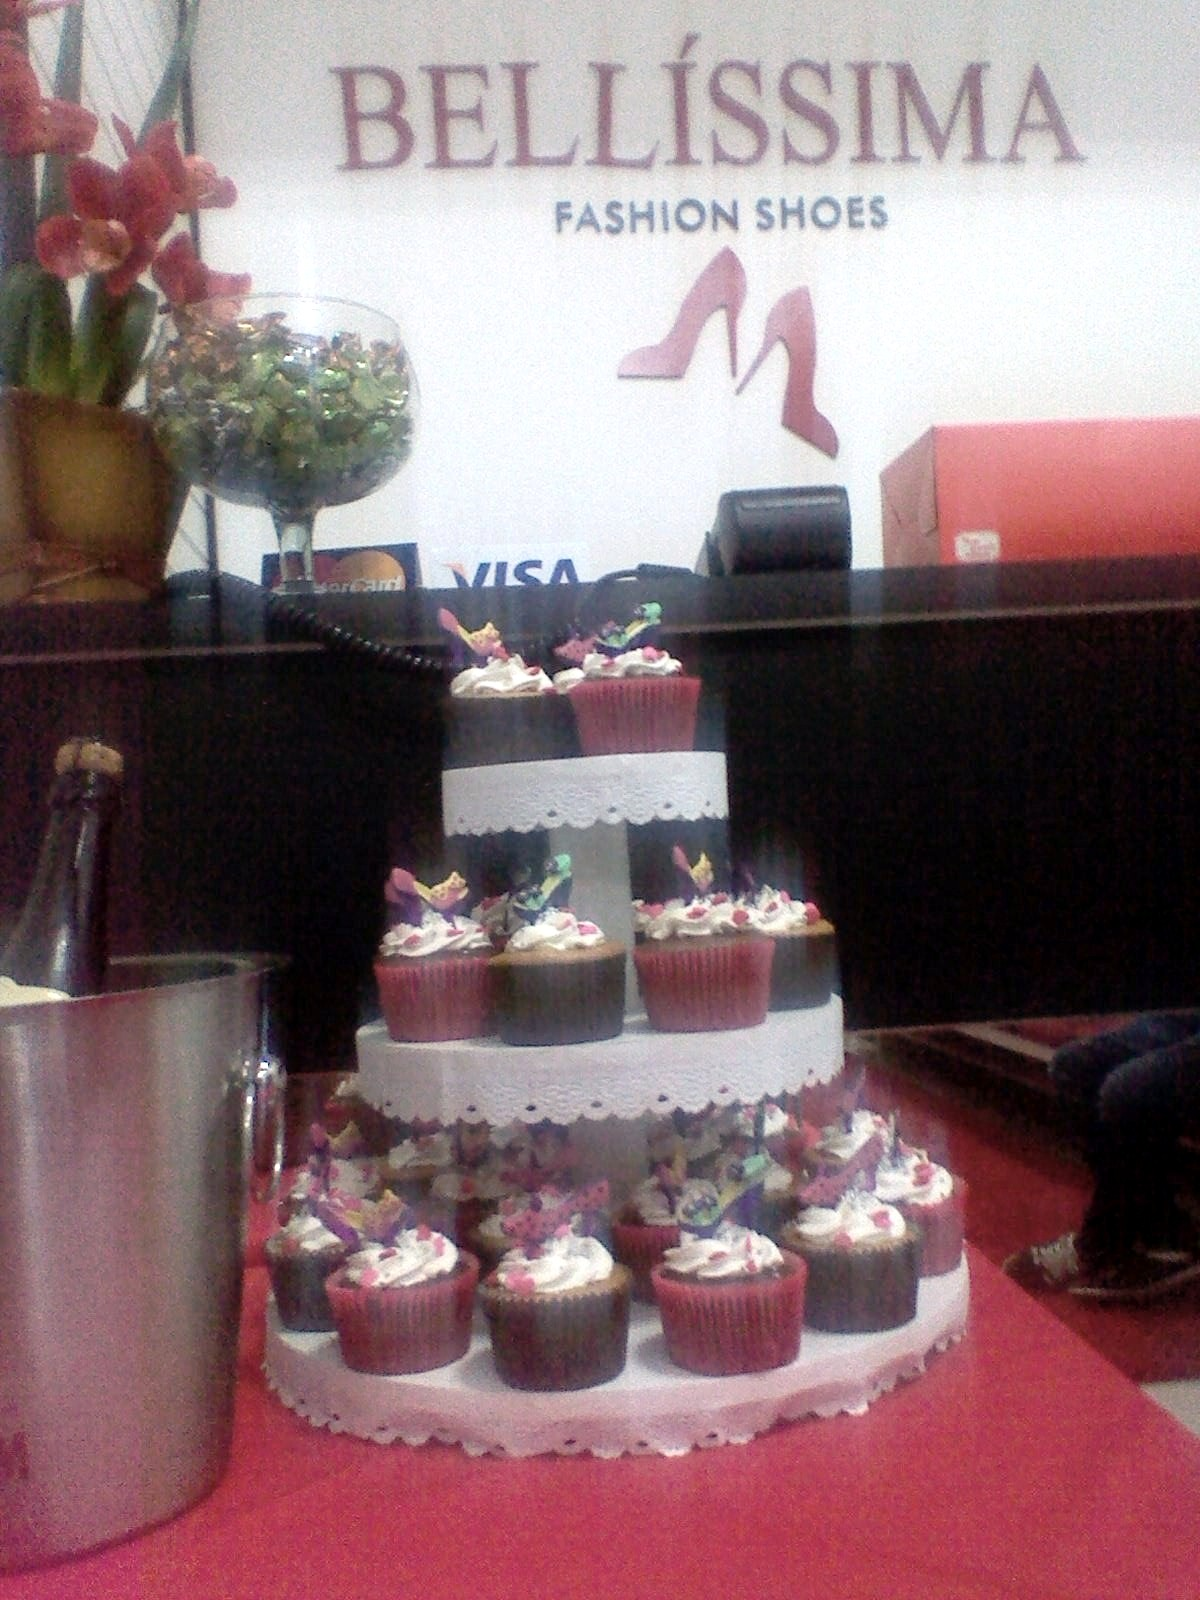 Bellíssima Fashion Shoes (Santo André - Centro) - Home ...